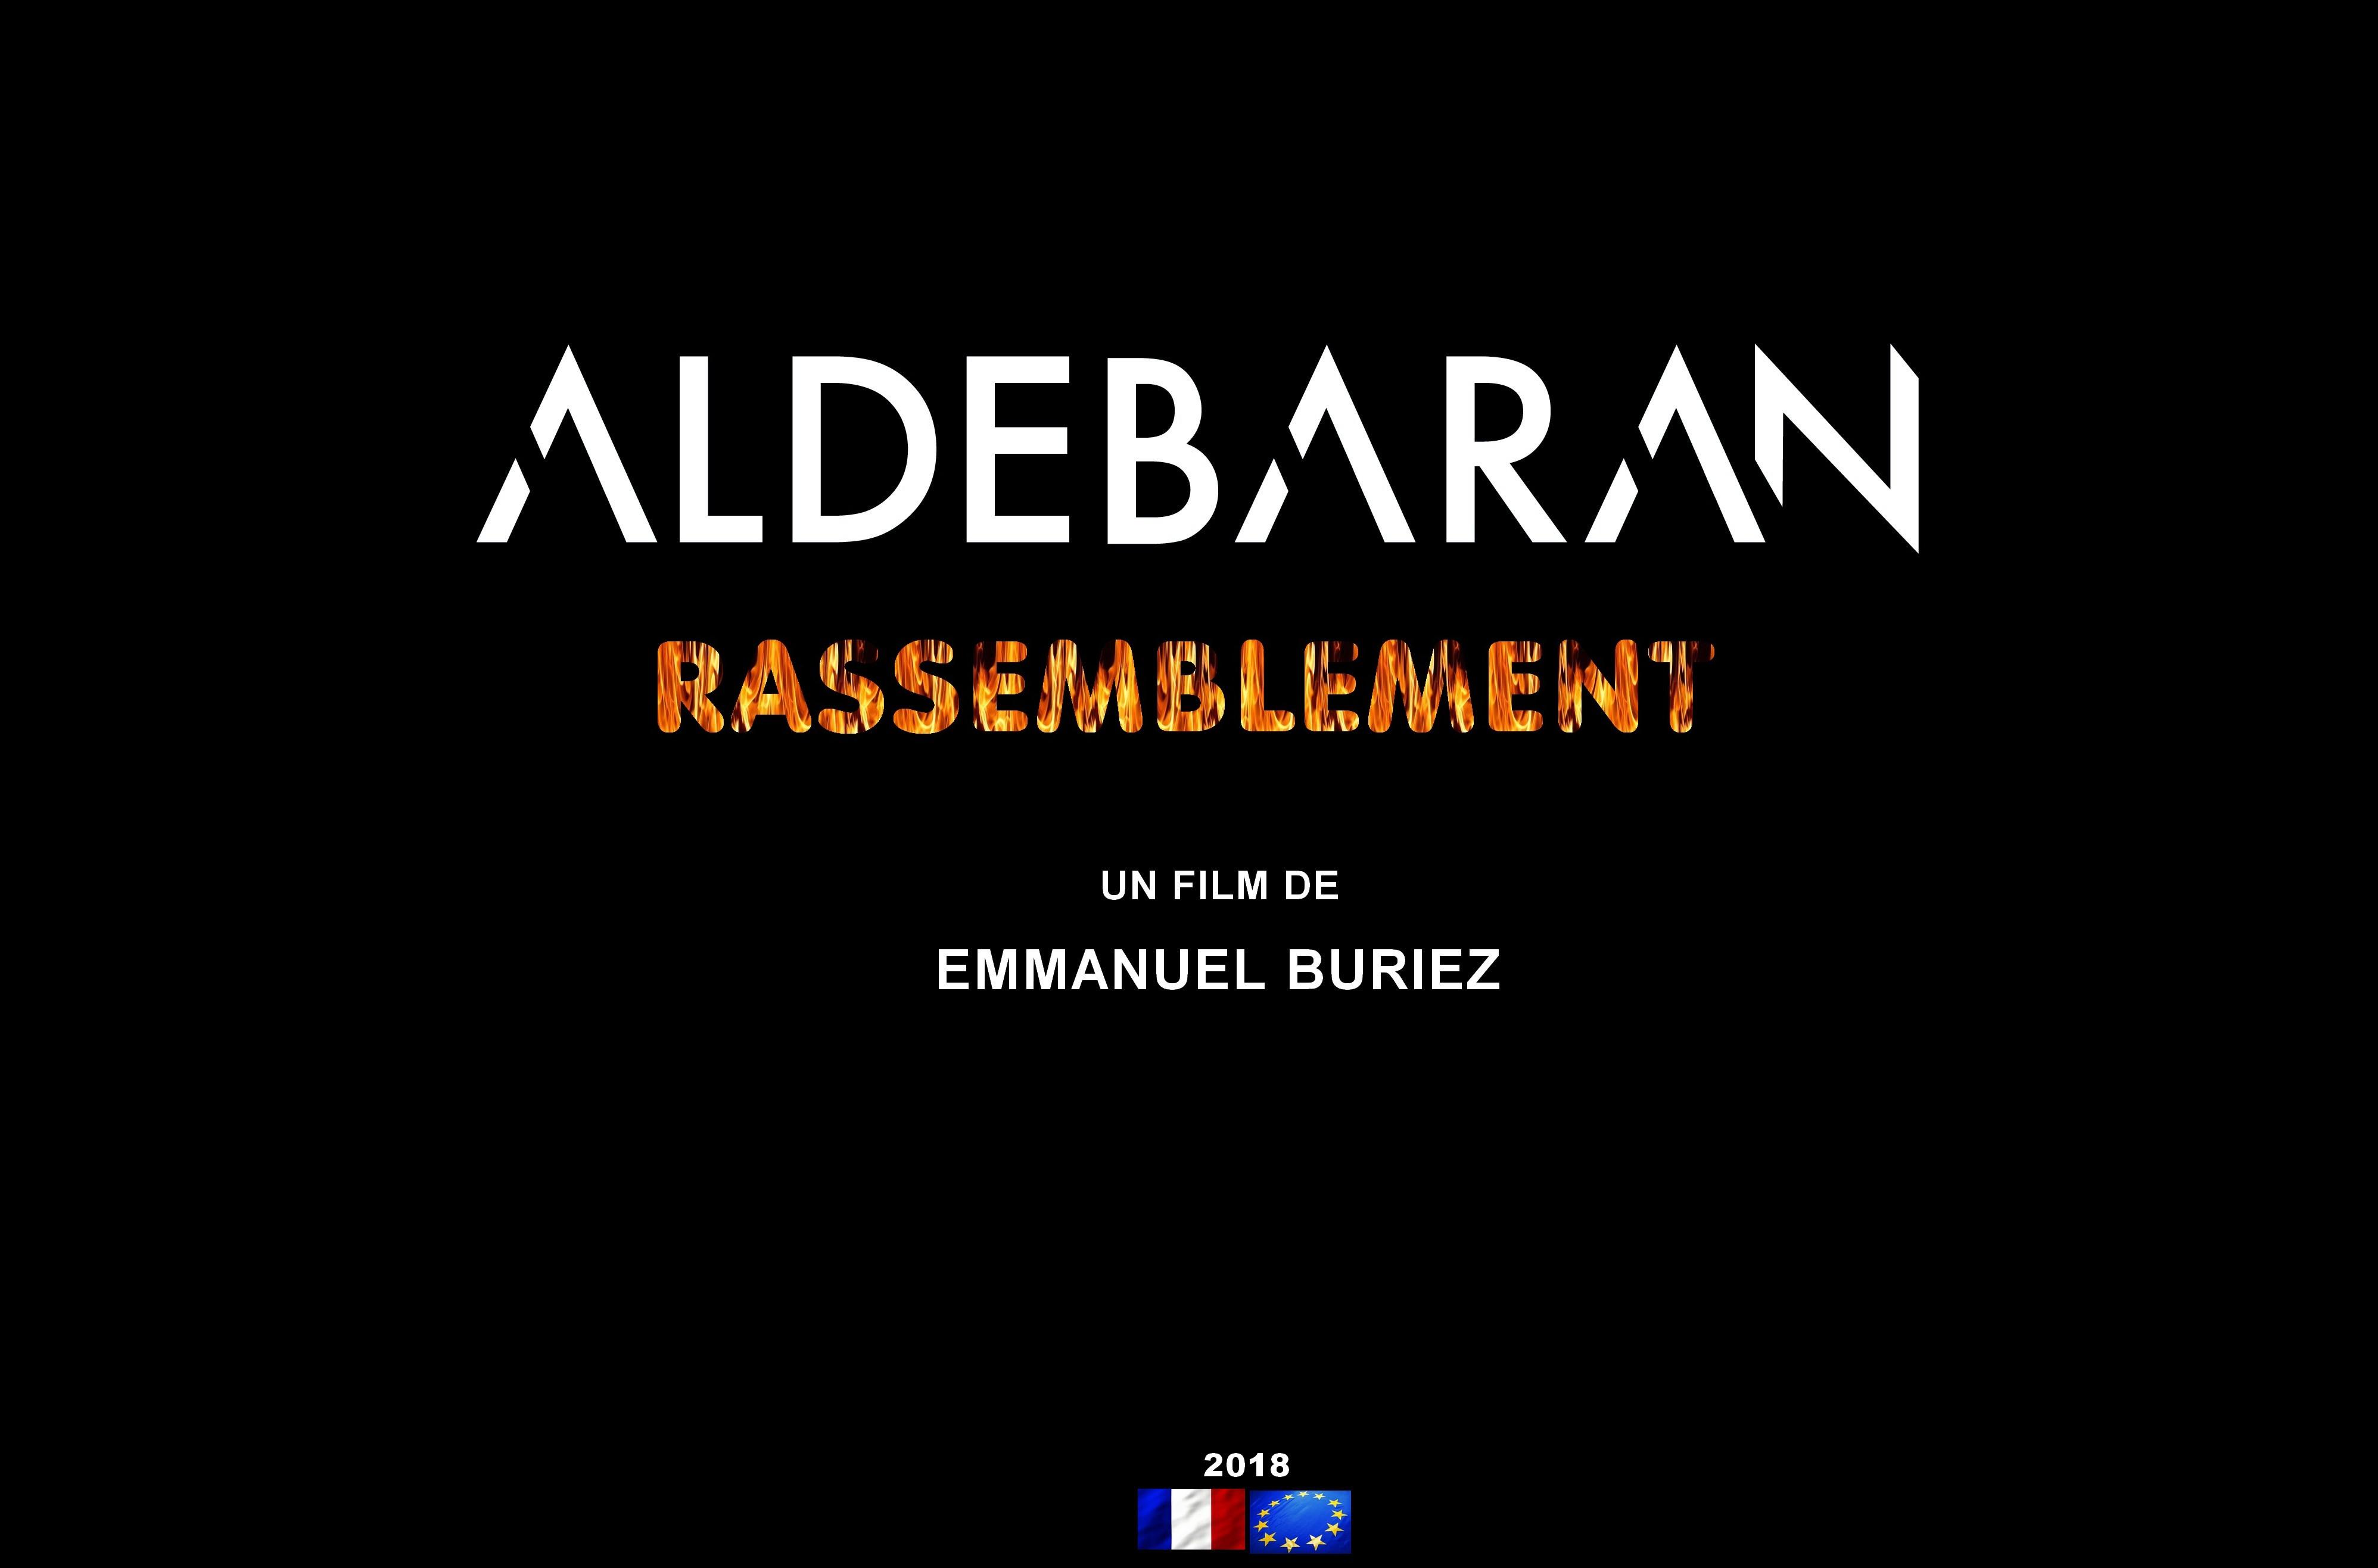 Aldebaran Rassemblement